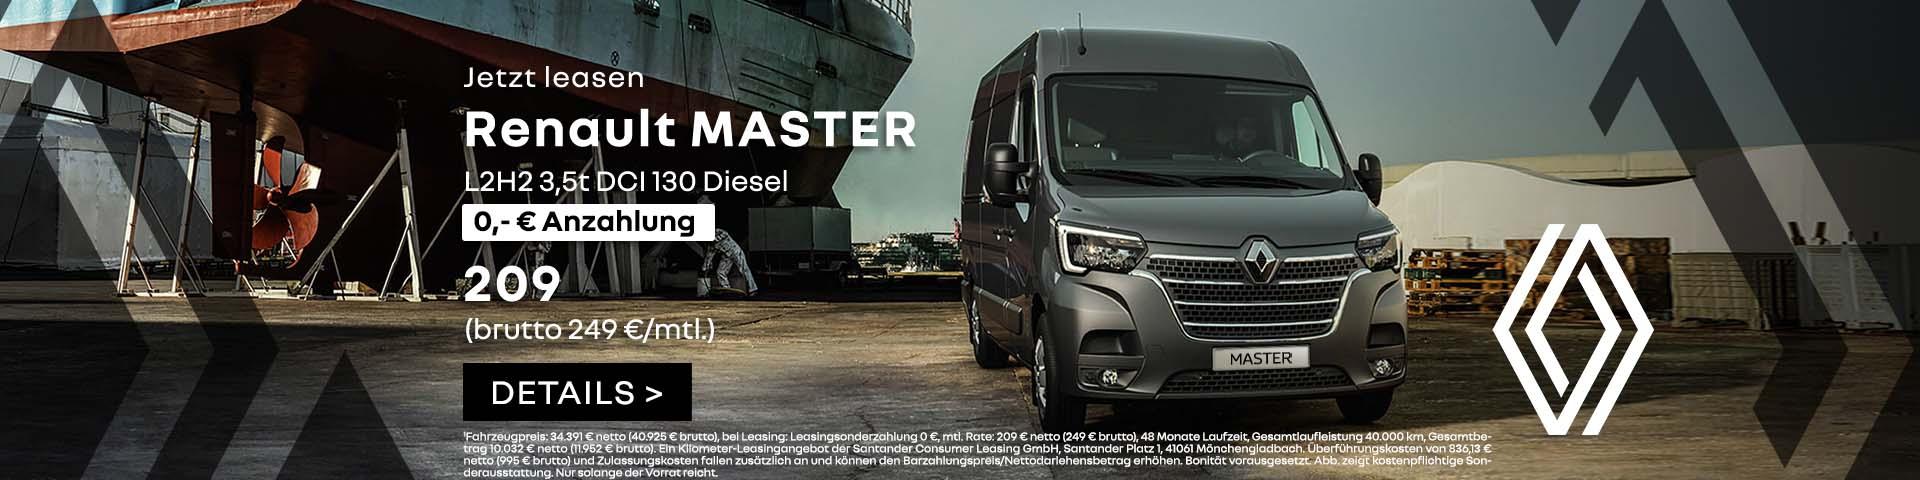 Autozentren P&A Renault Master